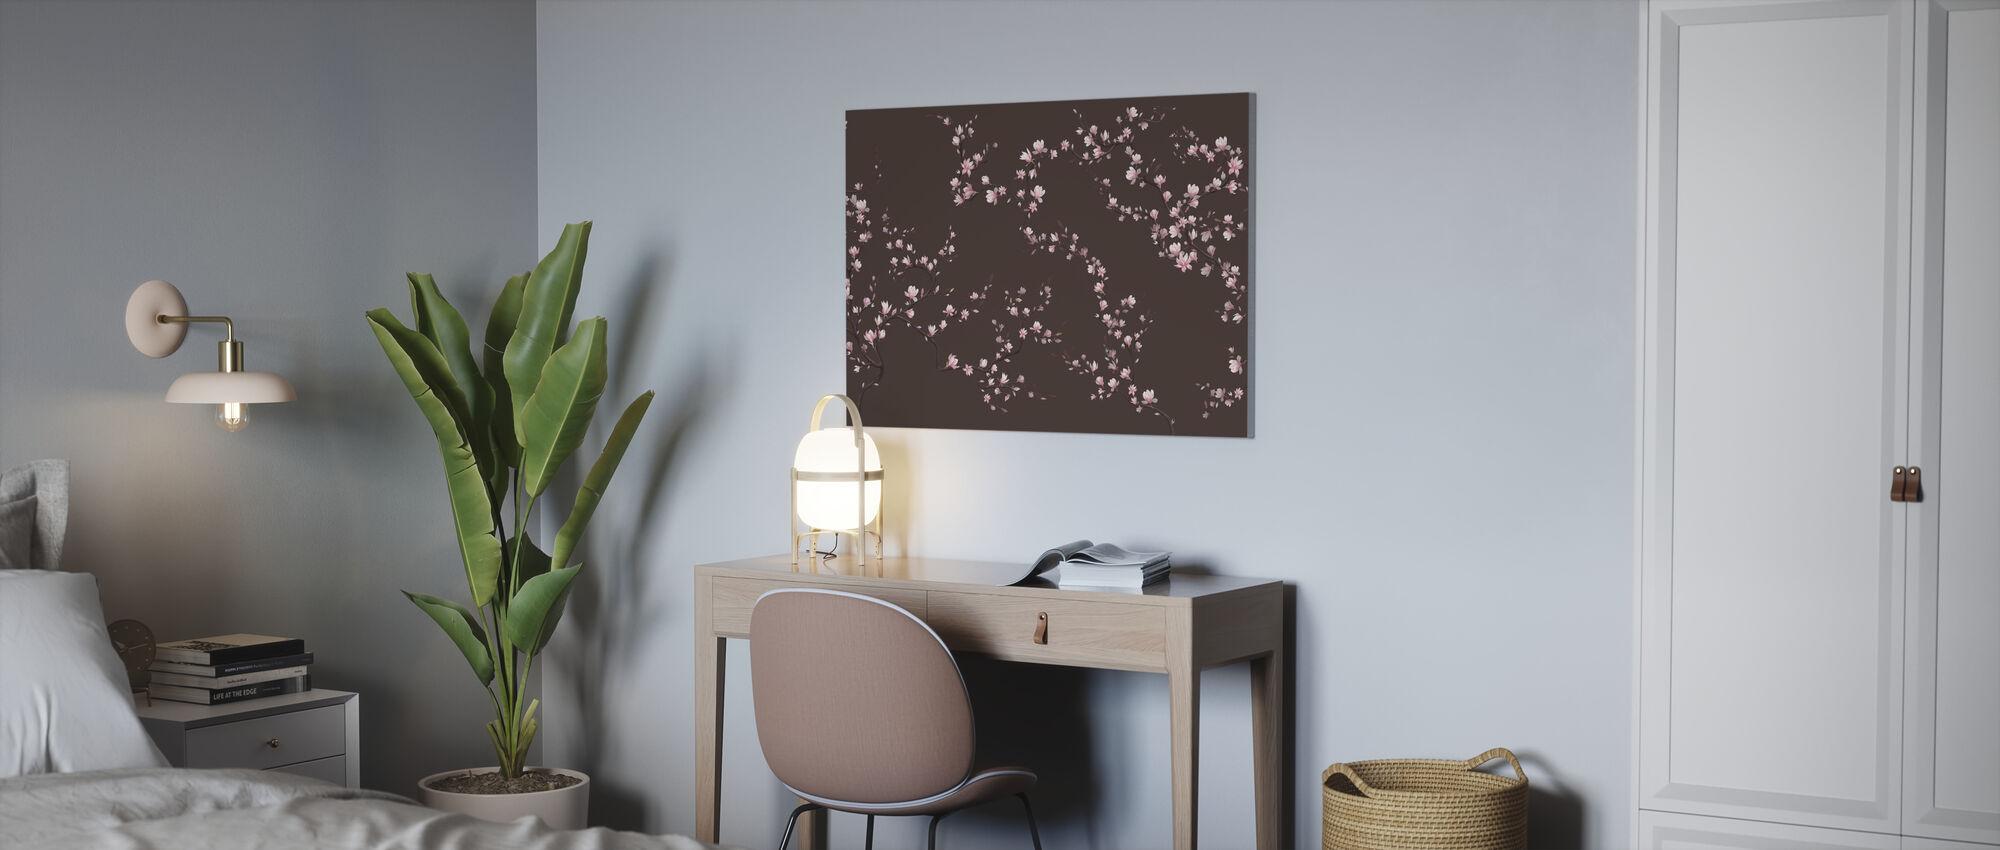 Flourishing Magnolia - Warm Brown - Canvas print - Office